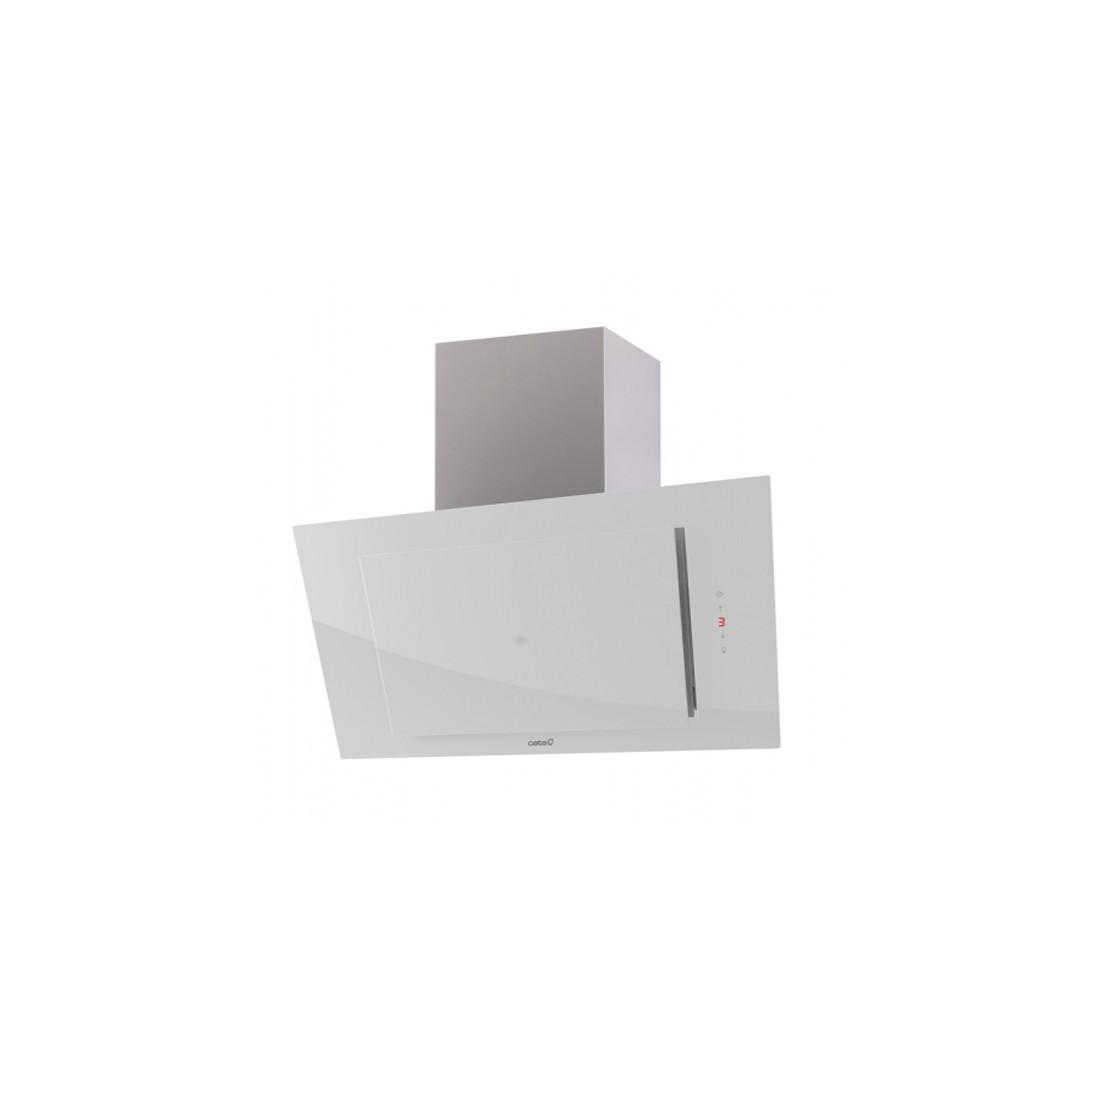 Campana Decorativa - Cata THALASSA 800XGWH Blanco, 80 cm